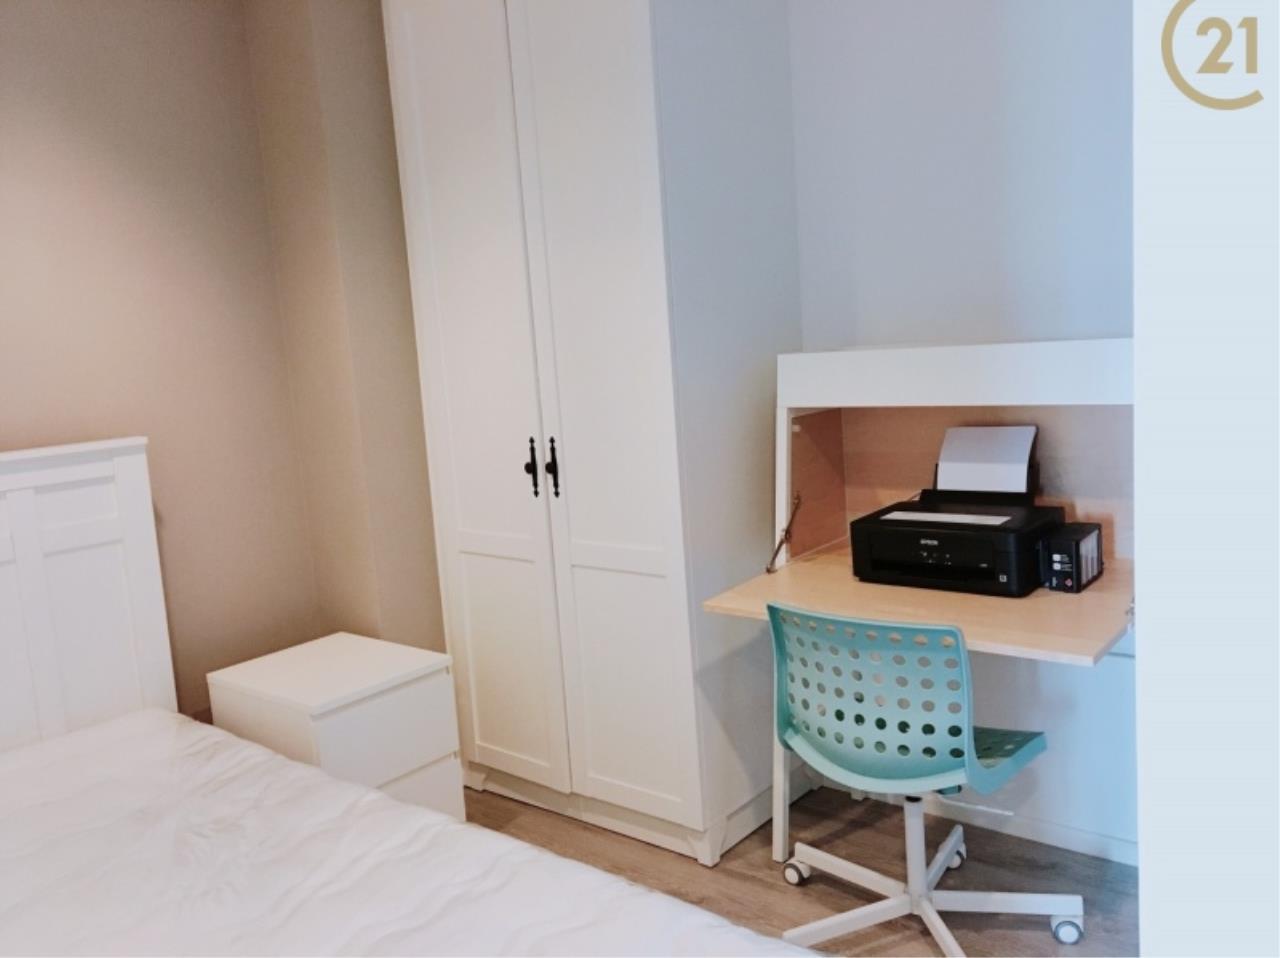 Century21 Skylux Agency's KnightsBridge / Condo For Sale / 2 Bedroom / 62 SQM / BTS Bearing / Bangkok 6